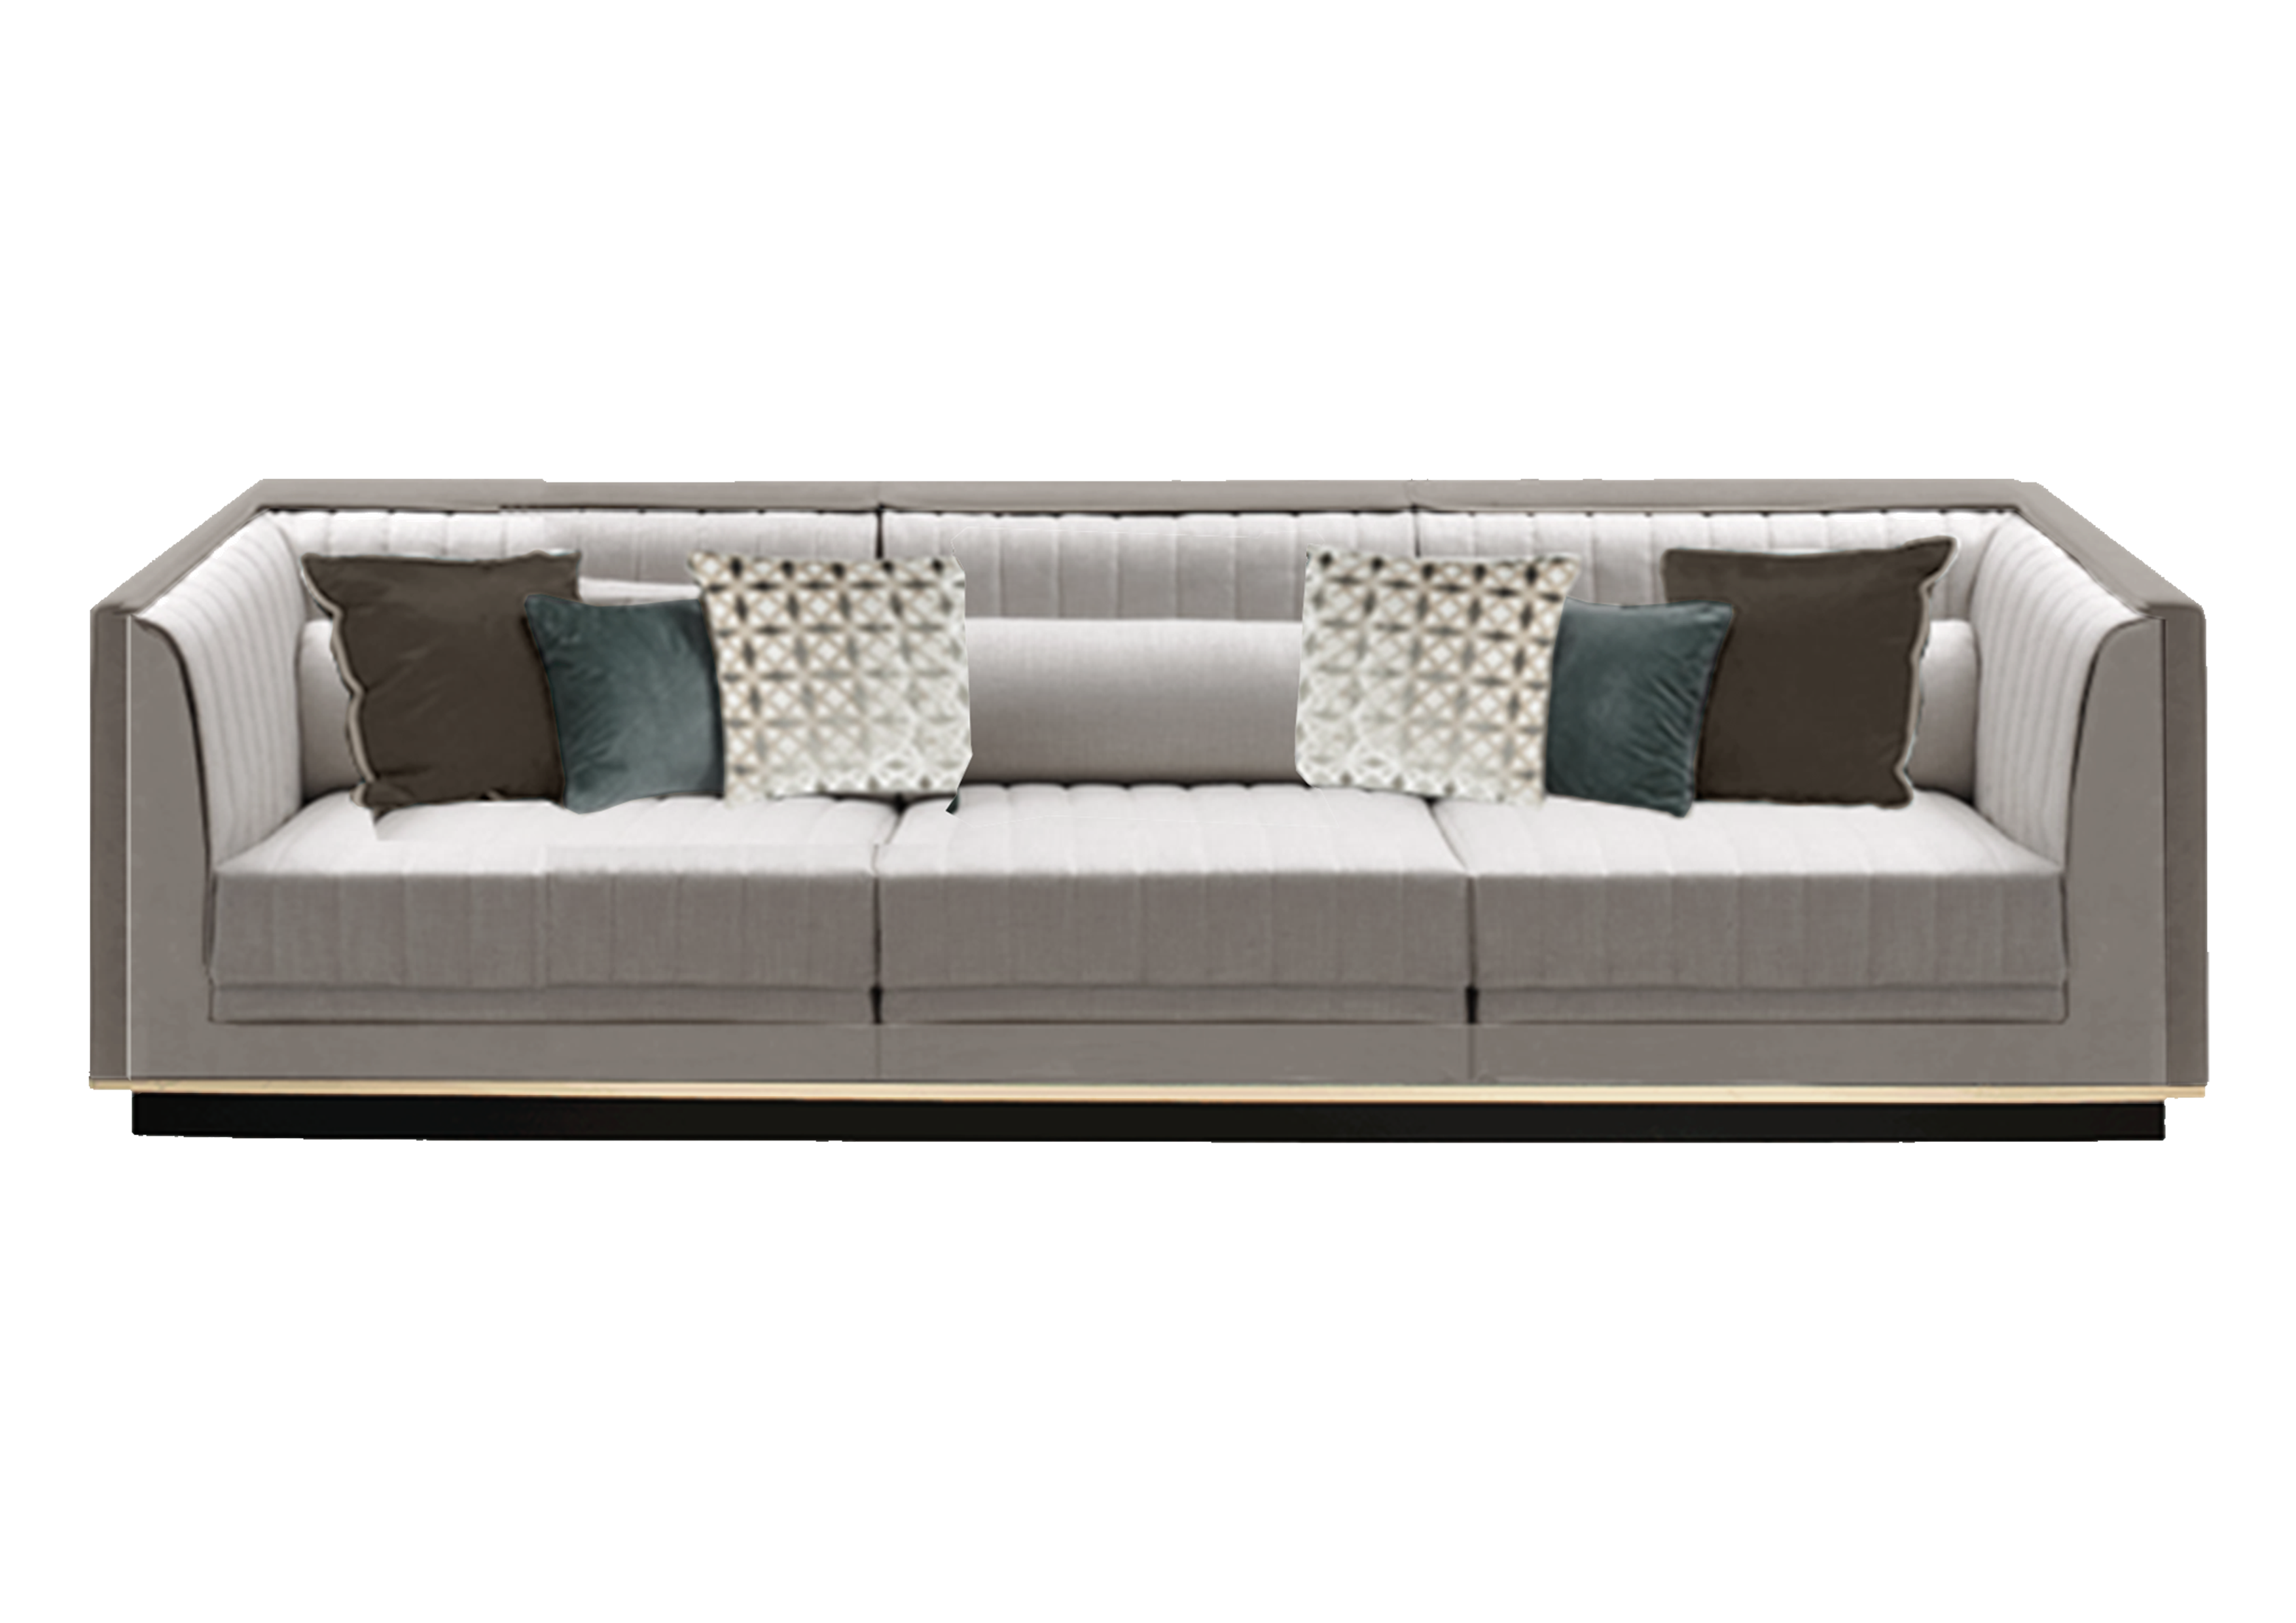 Fendi Plaza sofa sectional